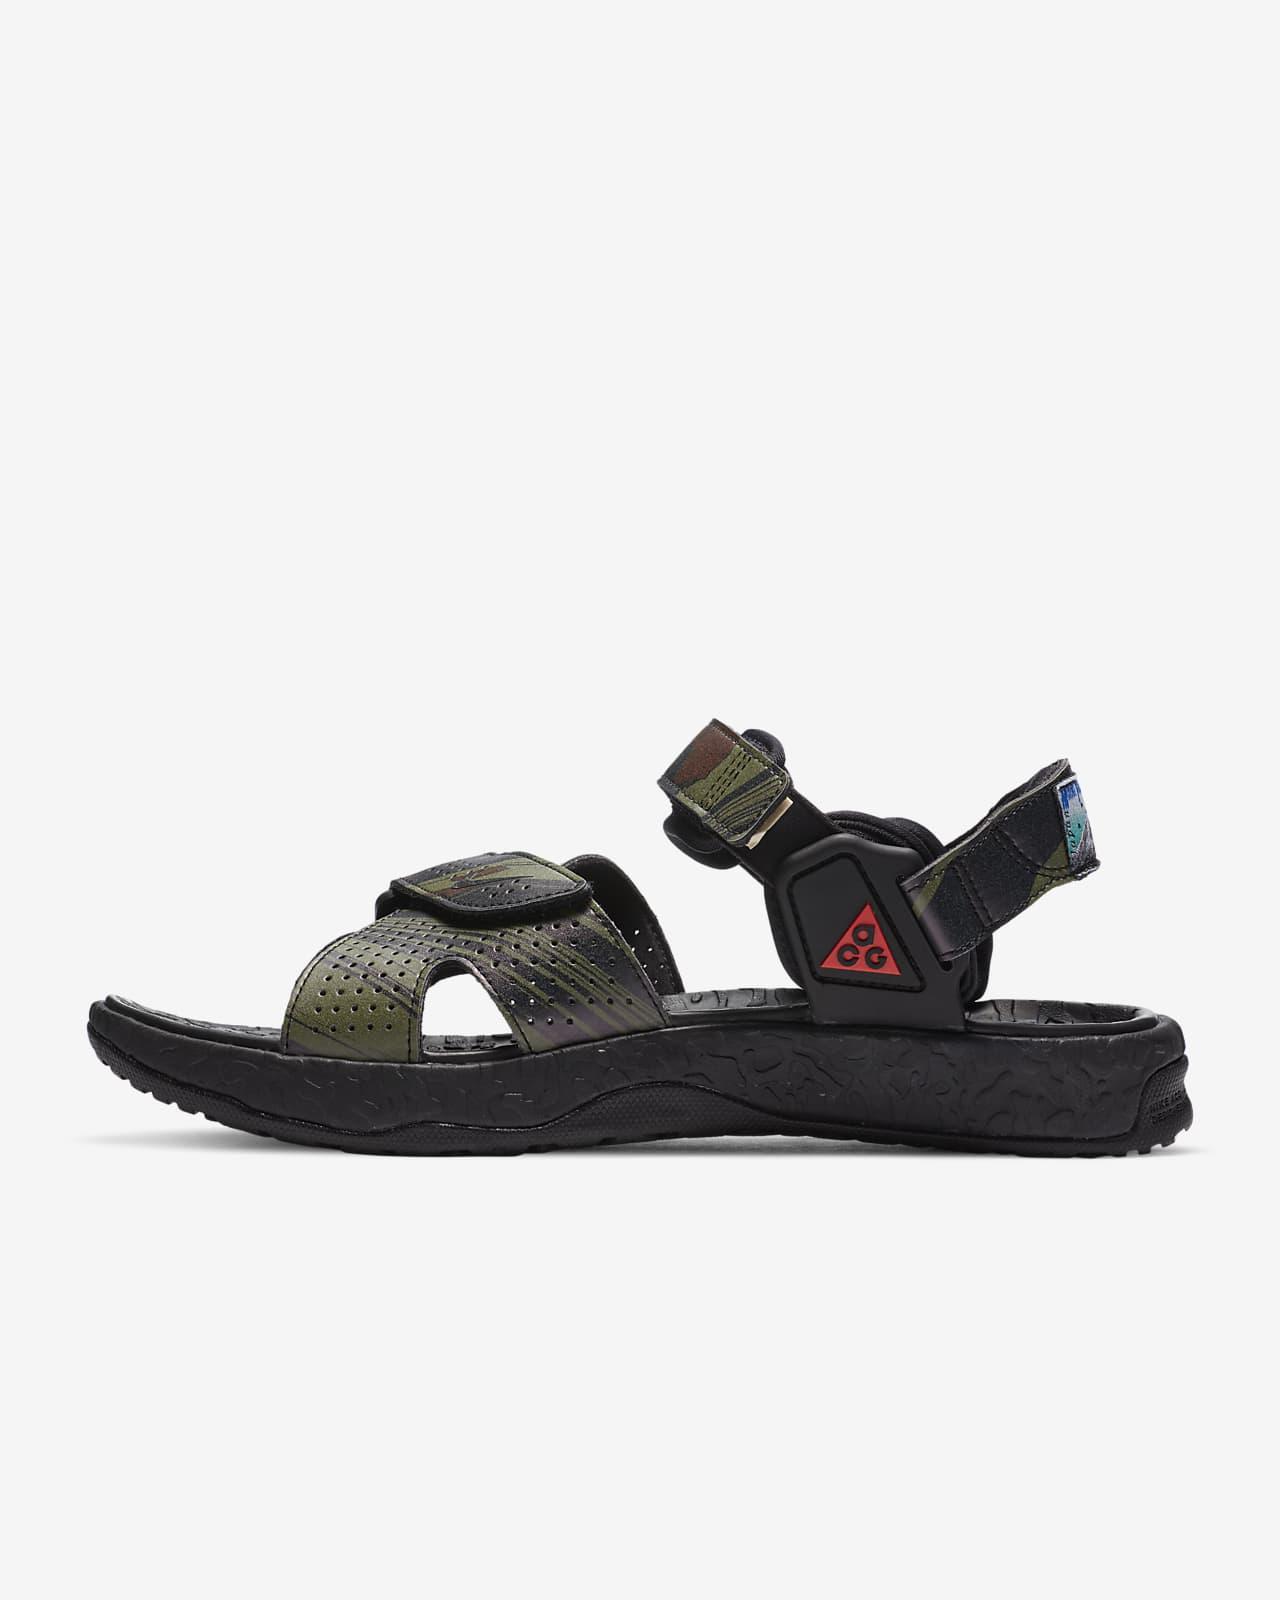 ACG Air Deschutz Fuji Rock 凉鞋